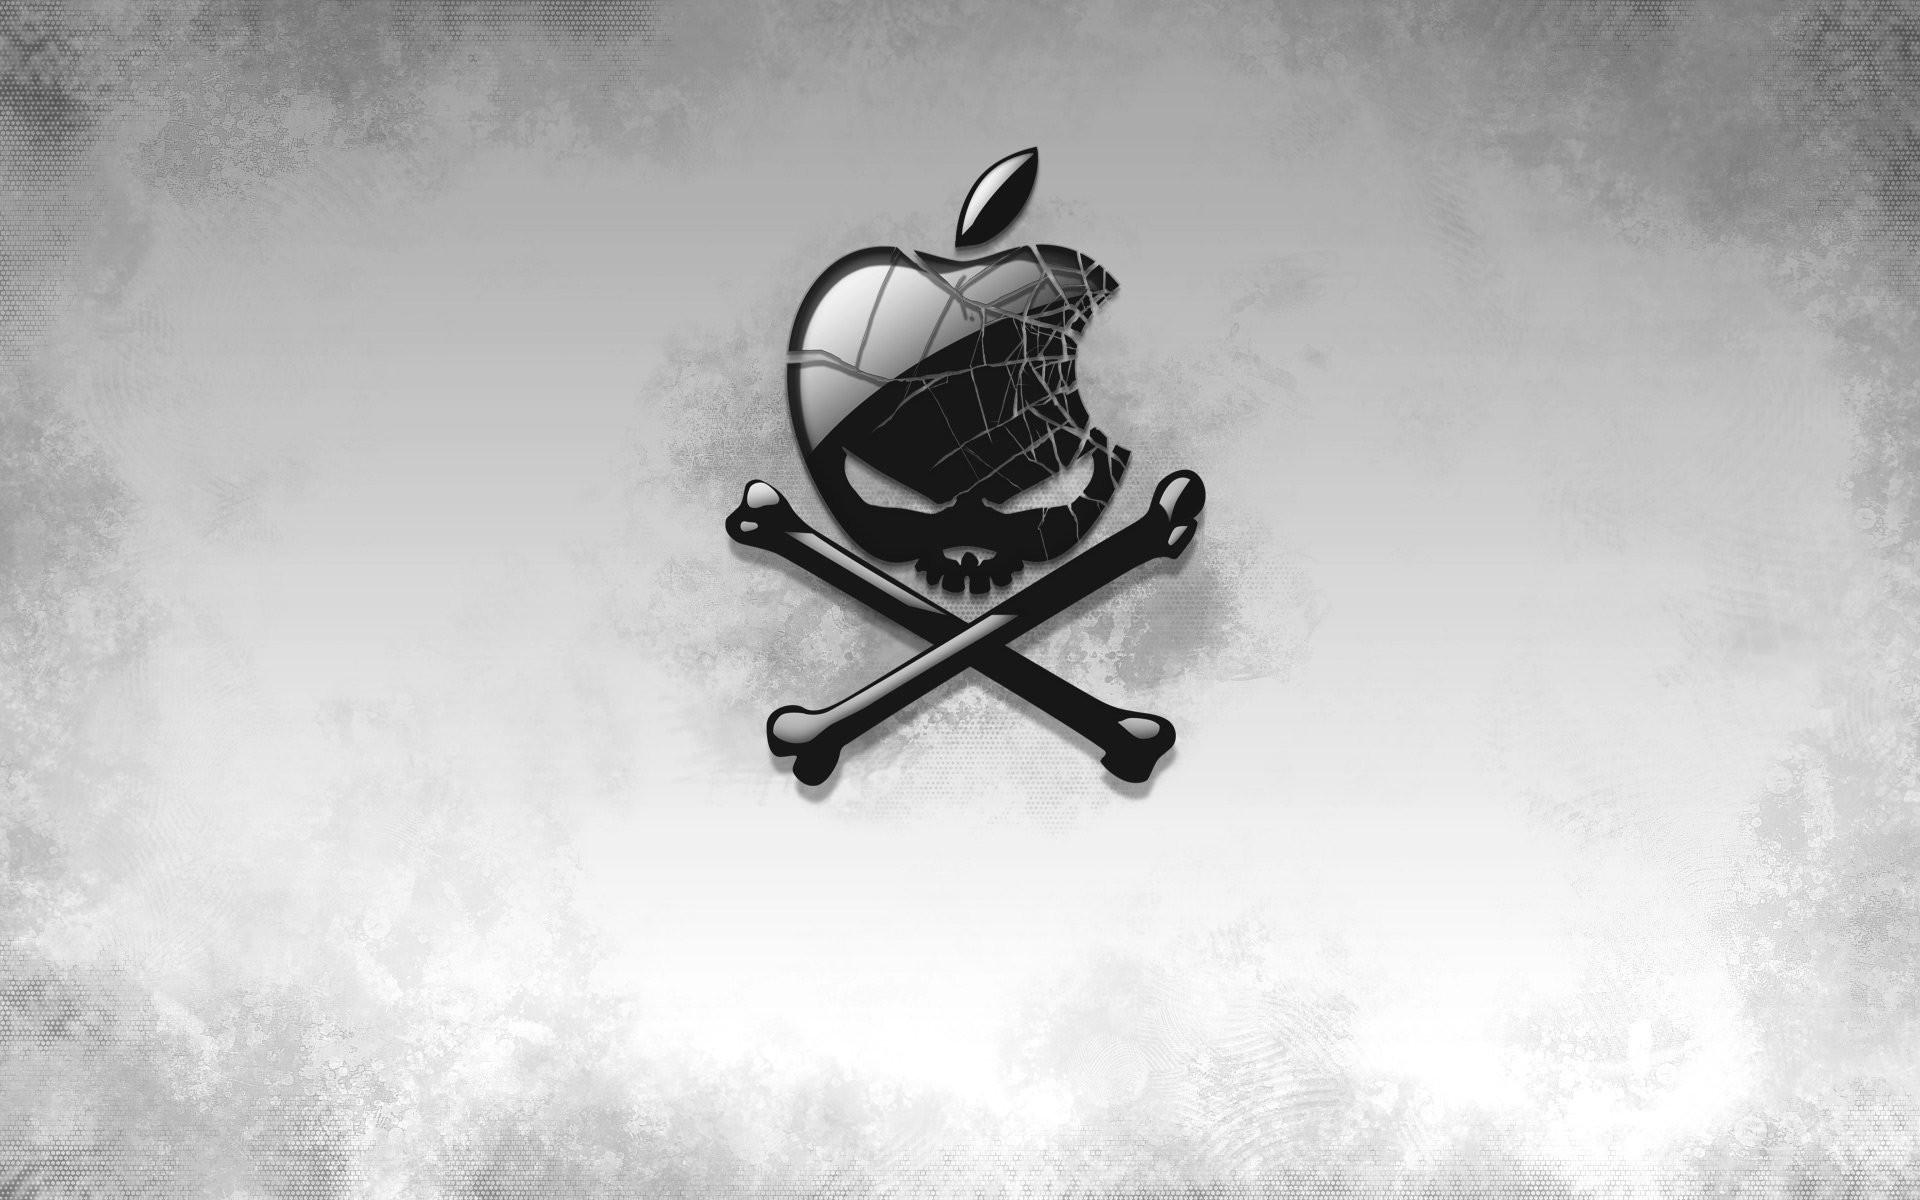 apple wallpaper hd 1080p ·①